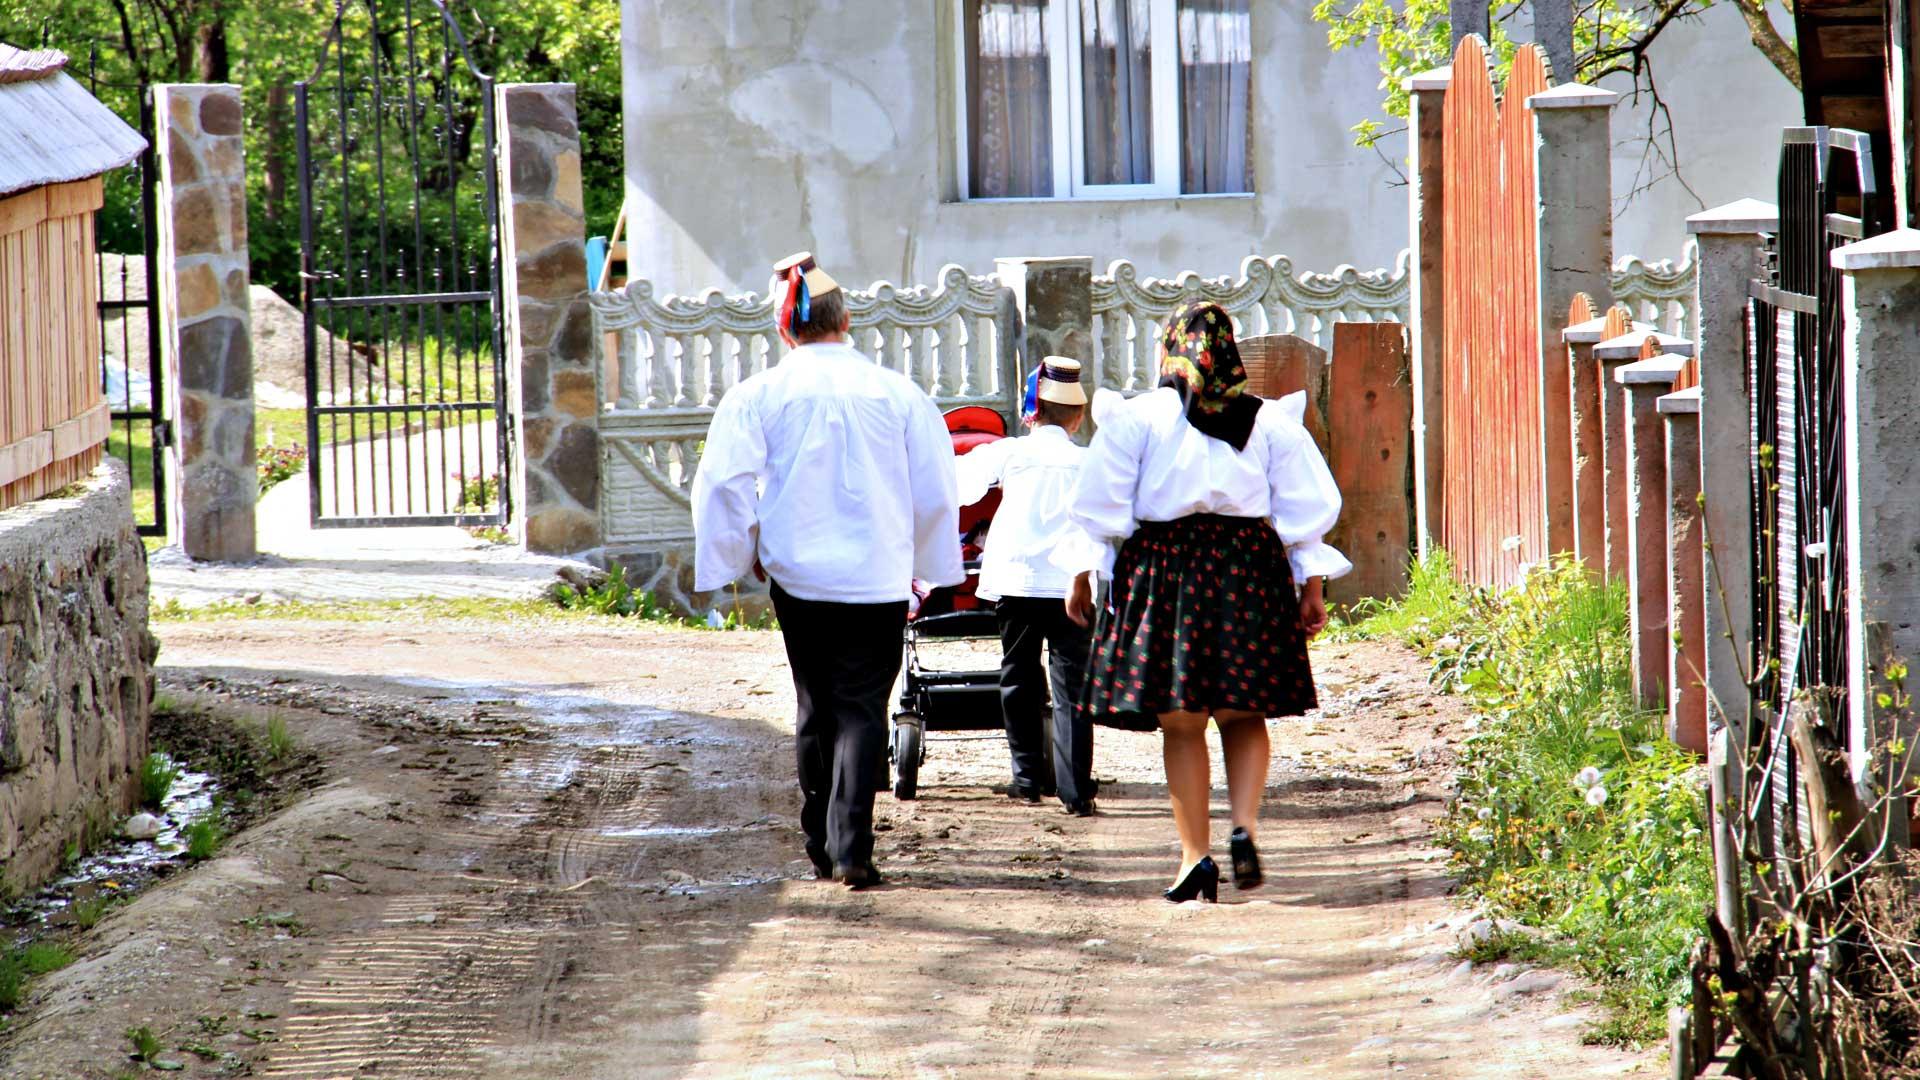 Photo by Ovidiu Balaj